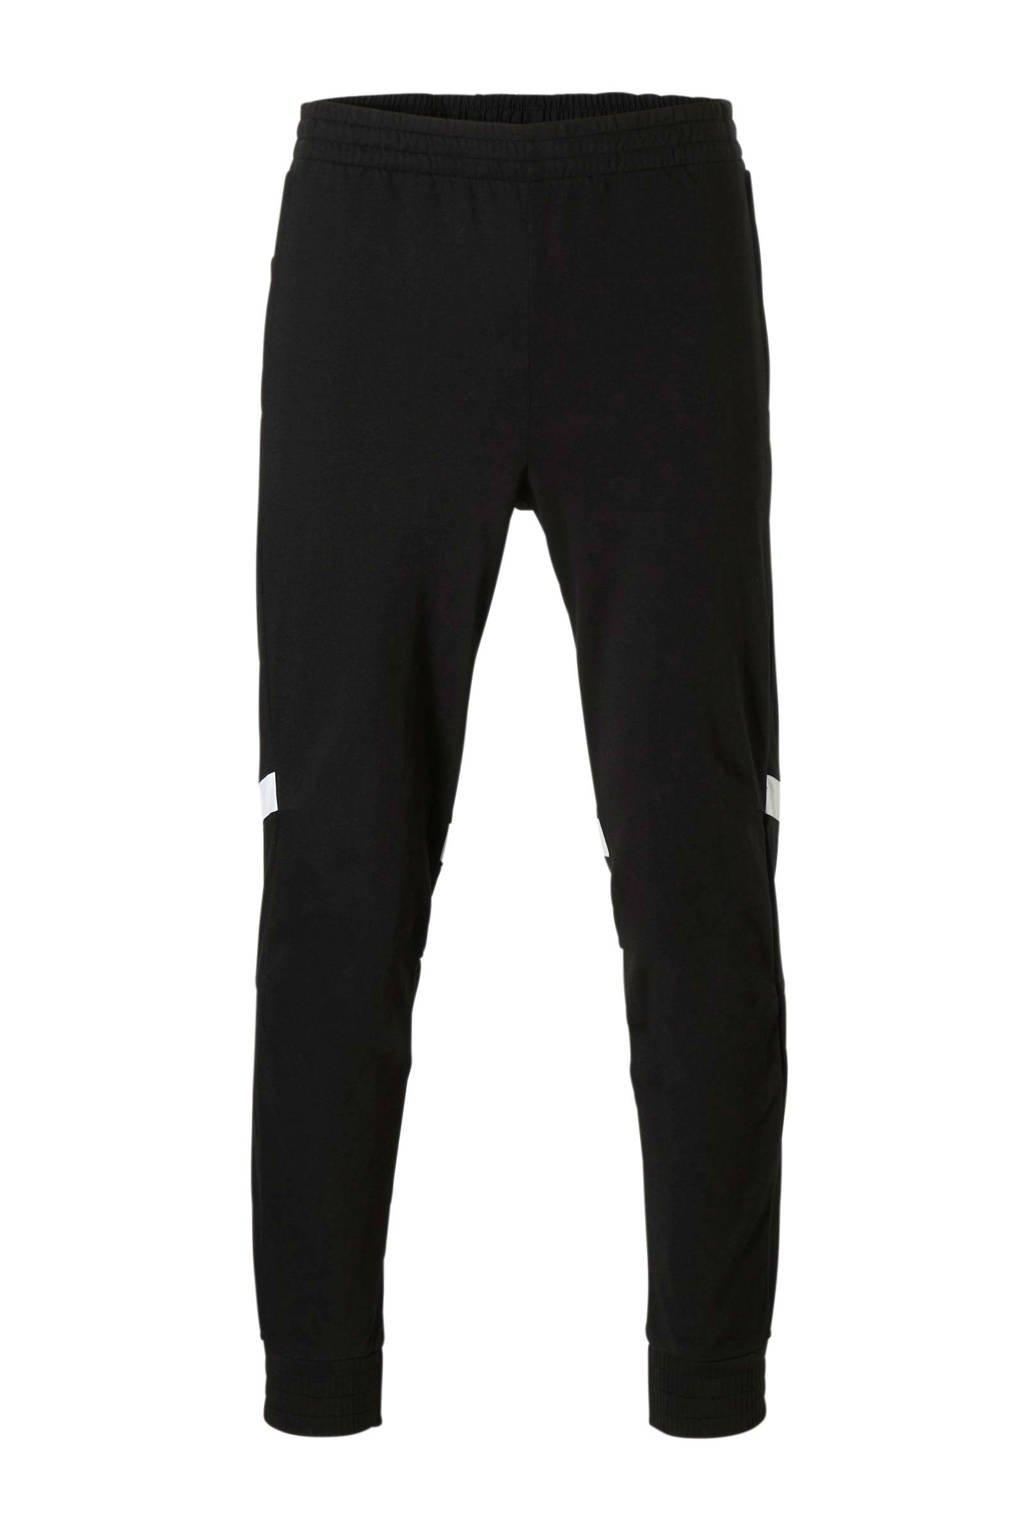 adidas performance joggingbroek, Zwart/wit